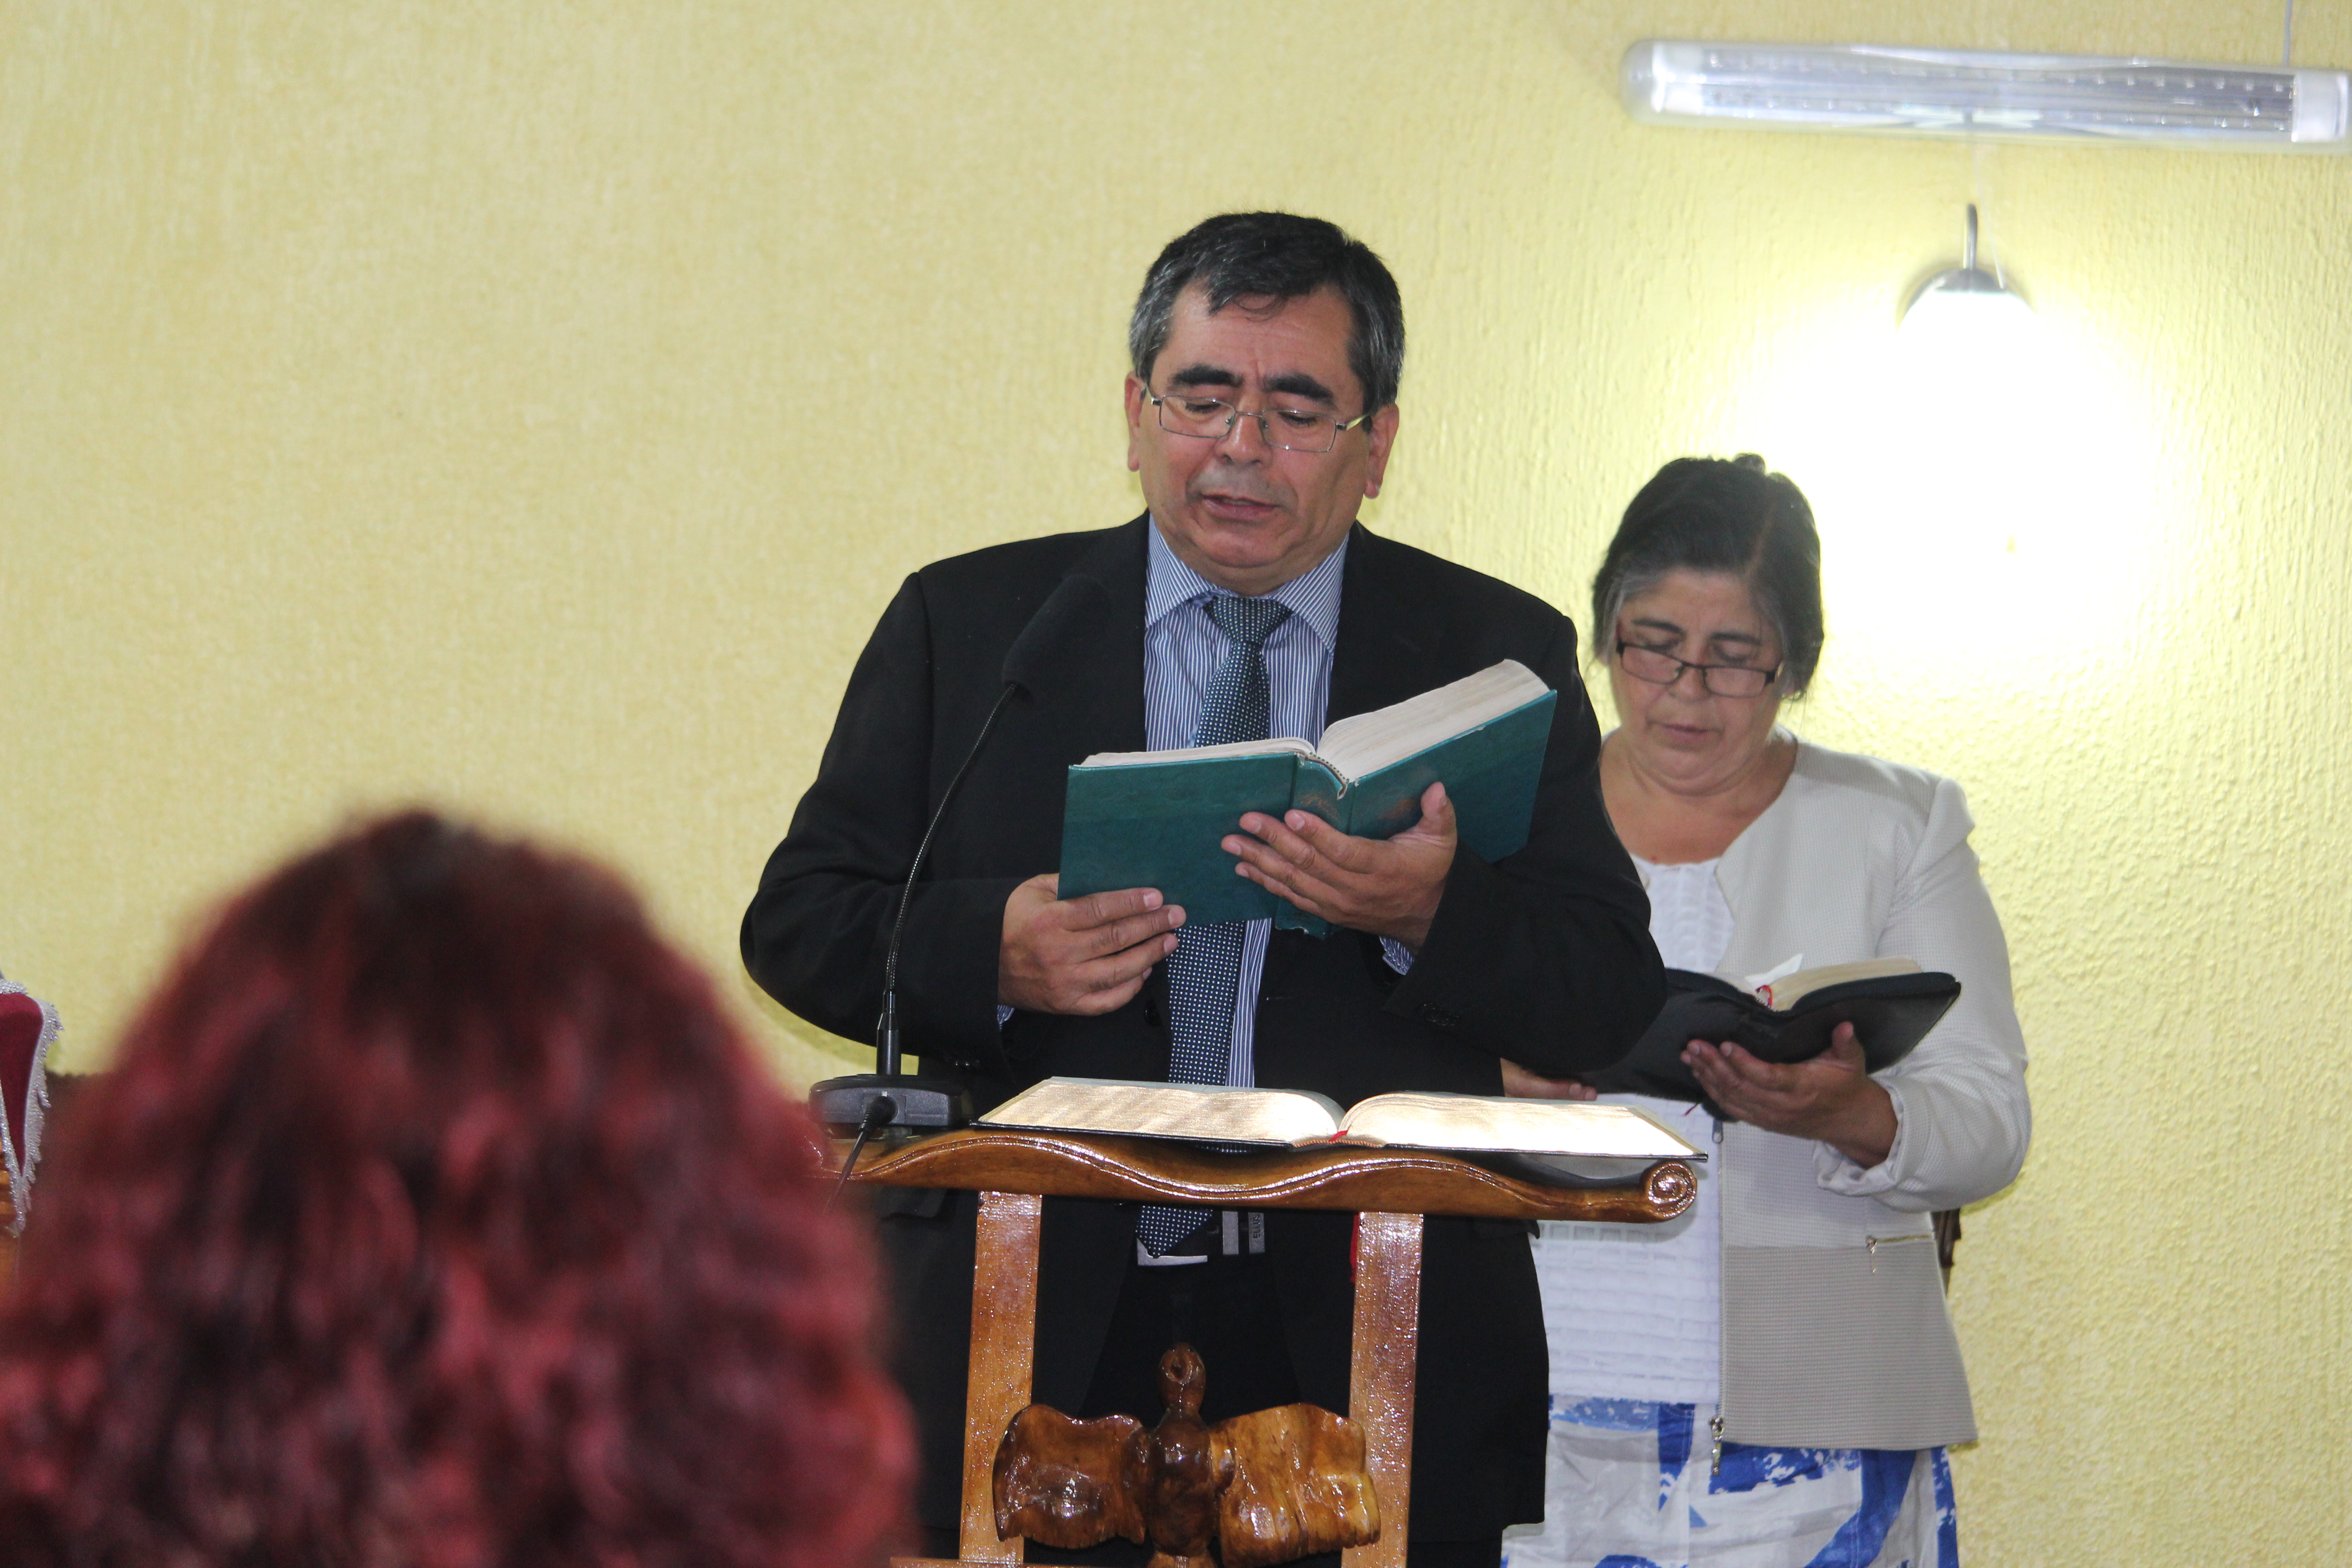 Bendición estudiantes IMPCH Pdte. Bulnes-Hualpén